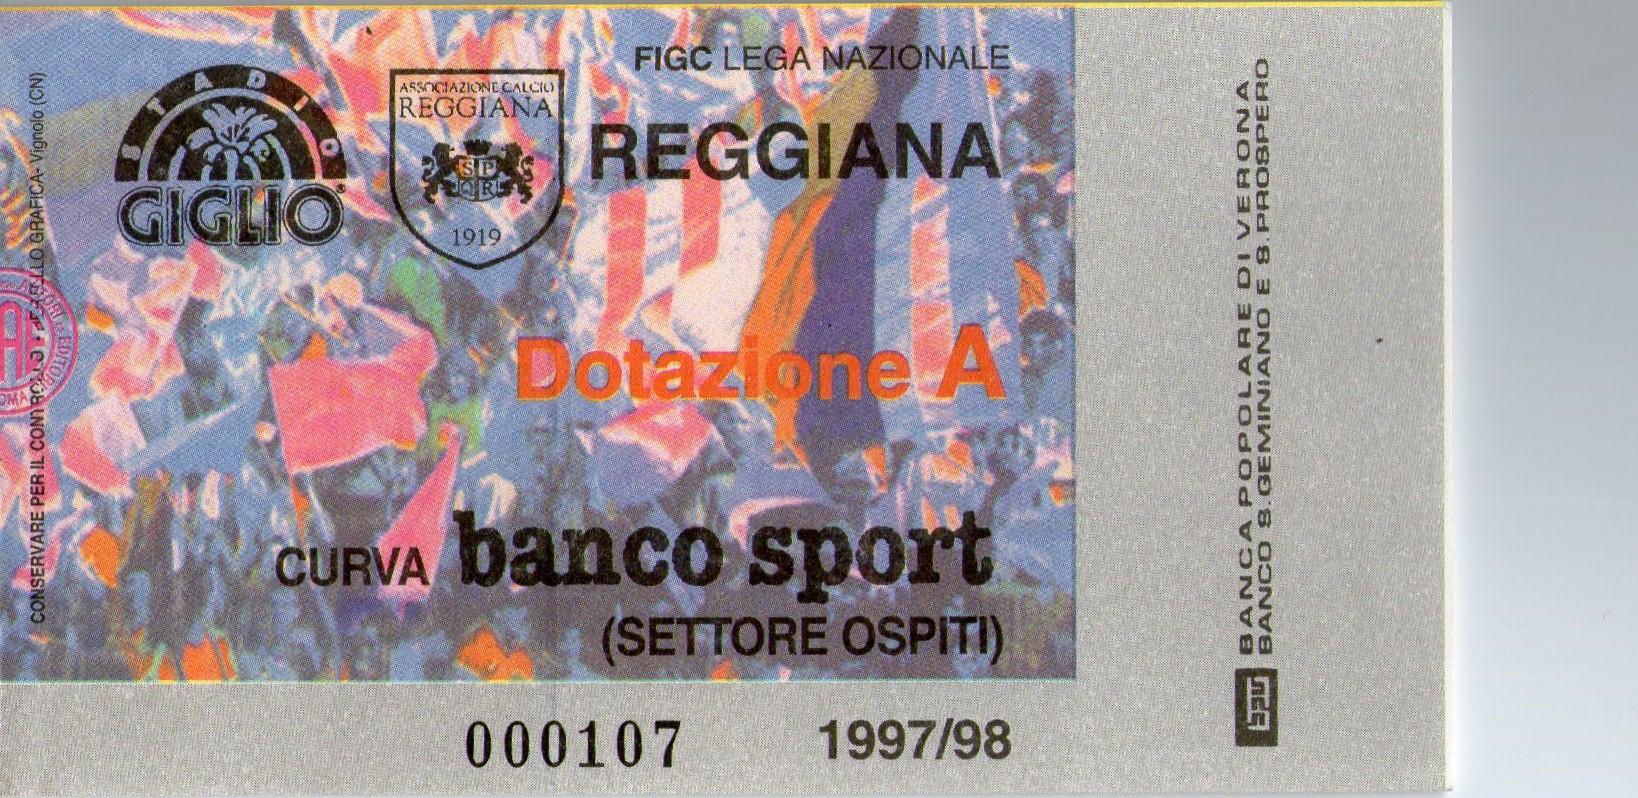 Curva Banco Sport